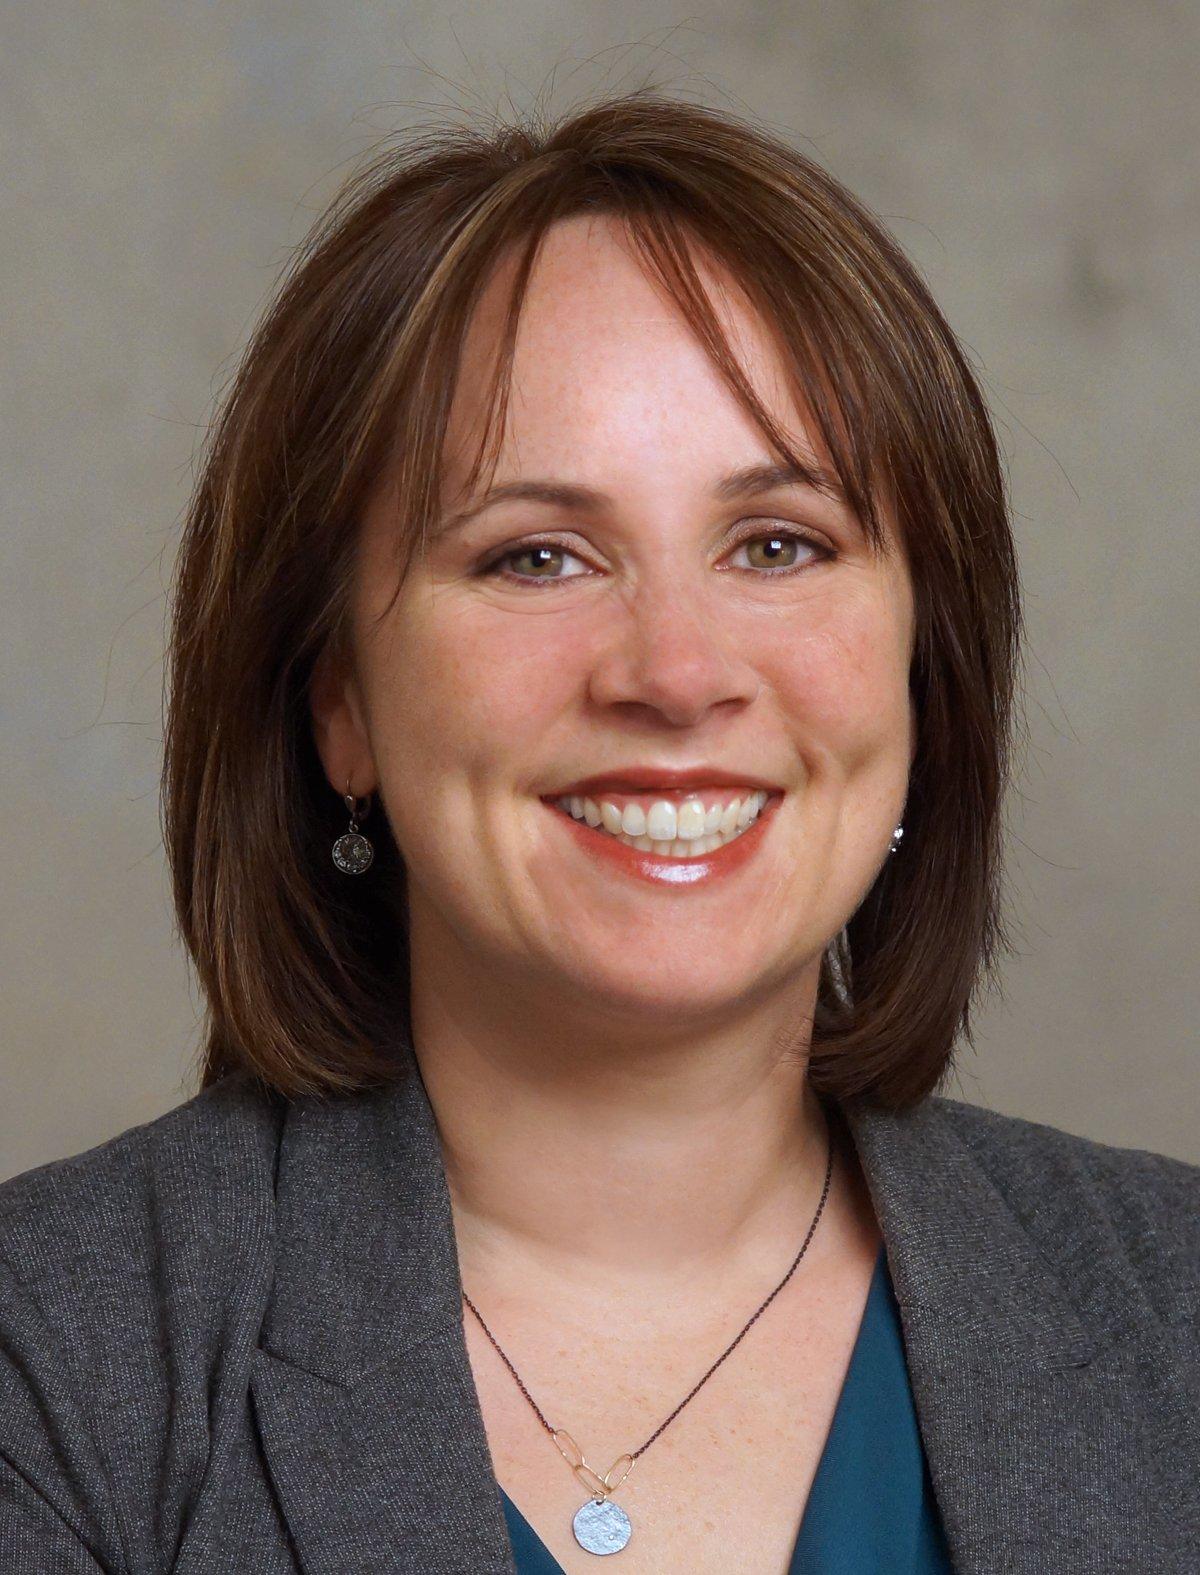 Therapist Tiffany Bowlby